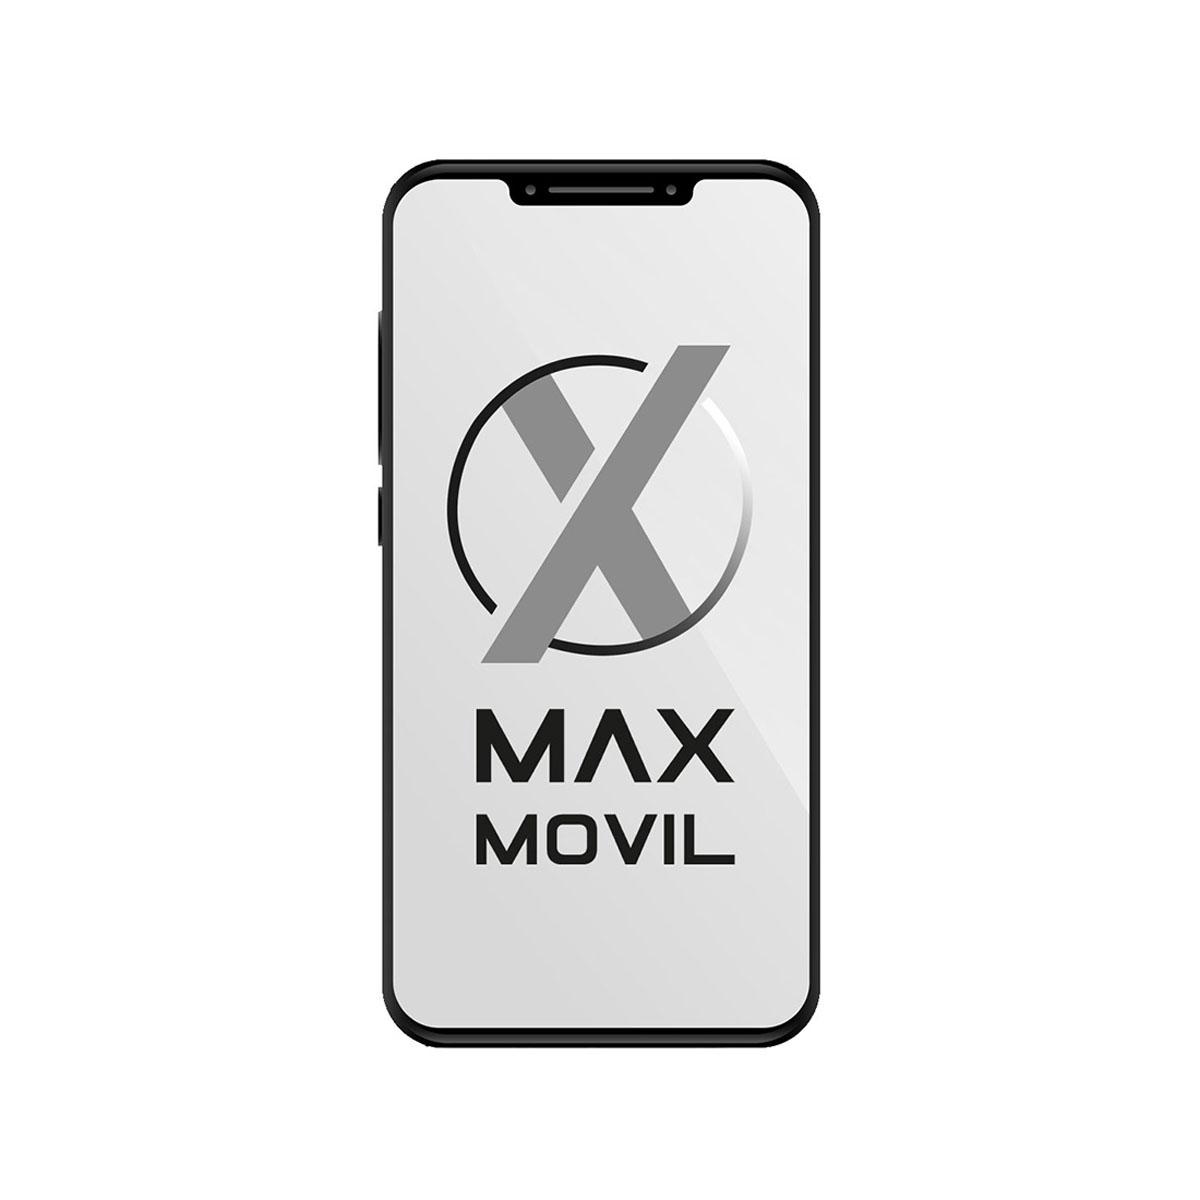 Funda libro Samsung EF-FI873BW blanca para Galaxy Express